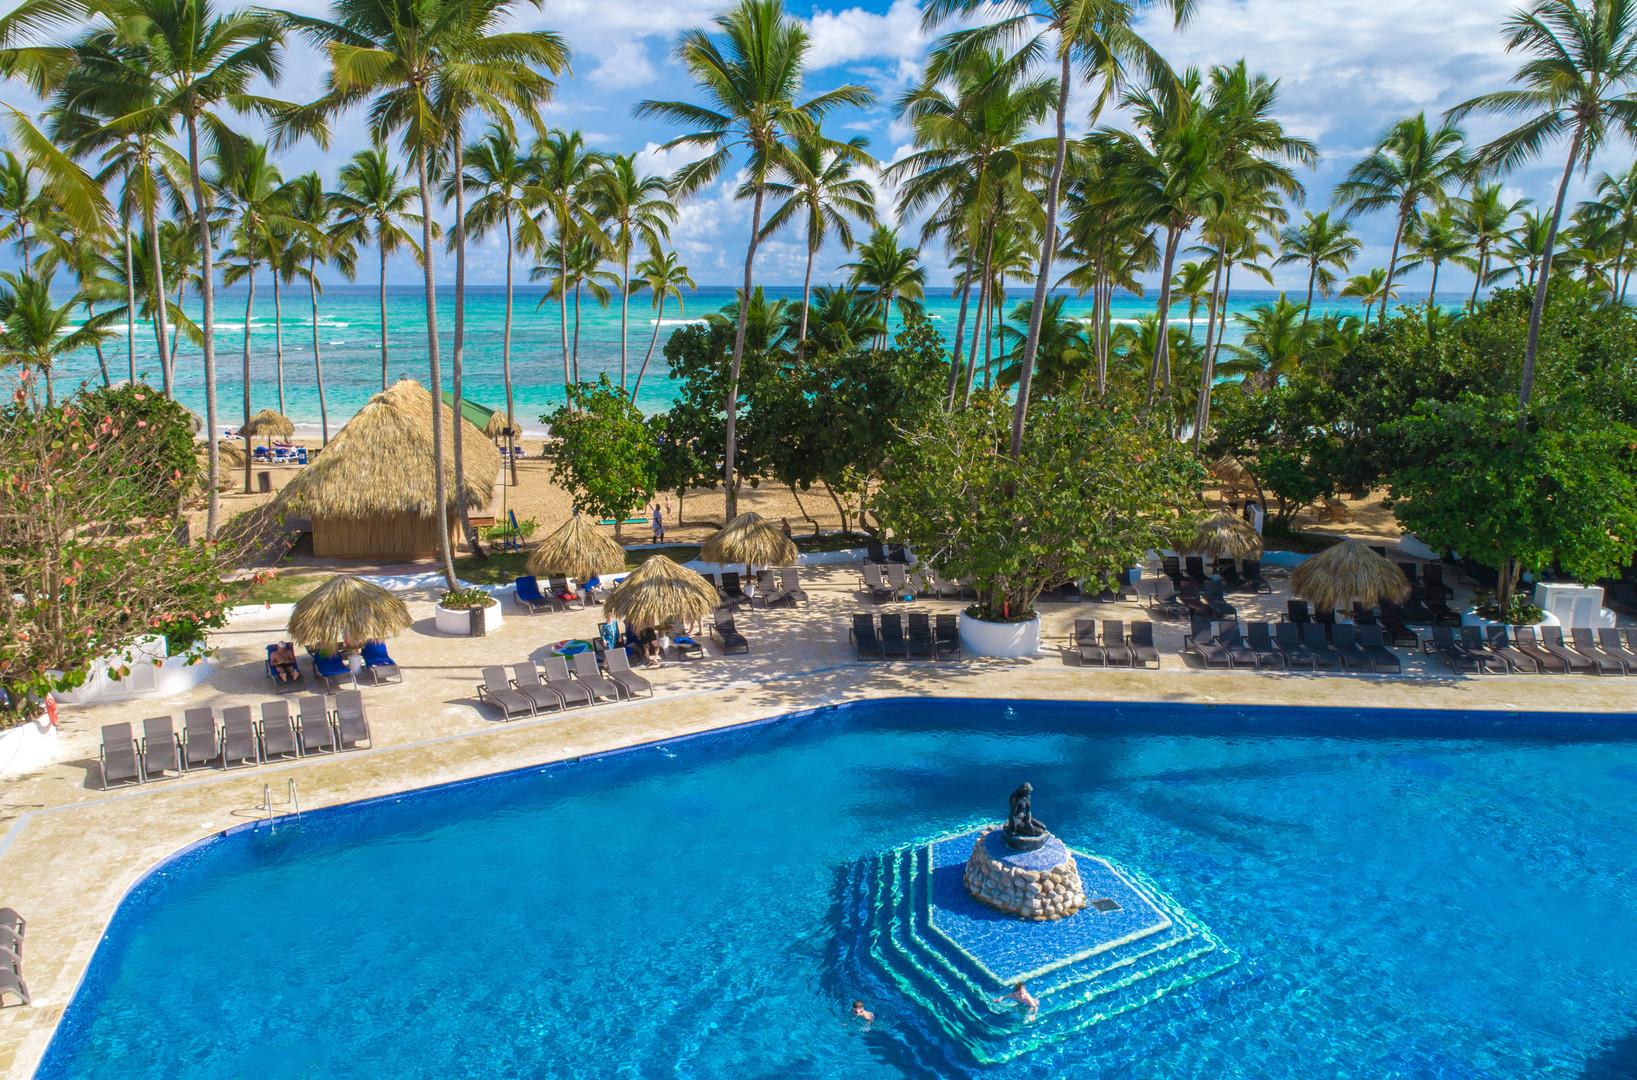 Hotel Grand Sirenis Punta Cana Resort